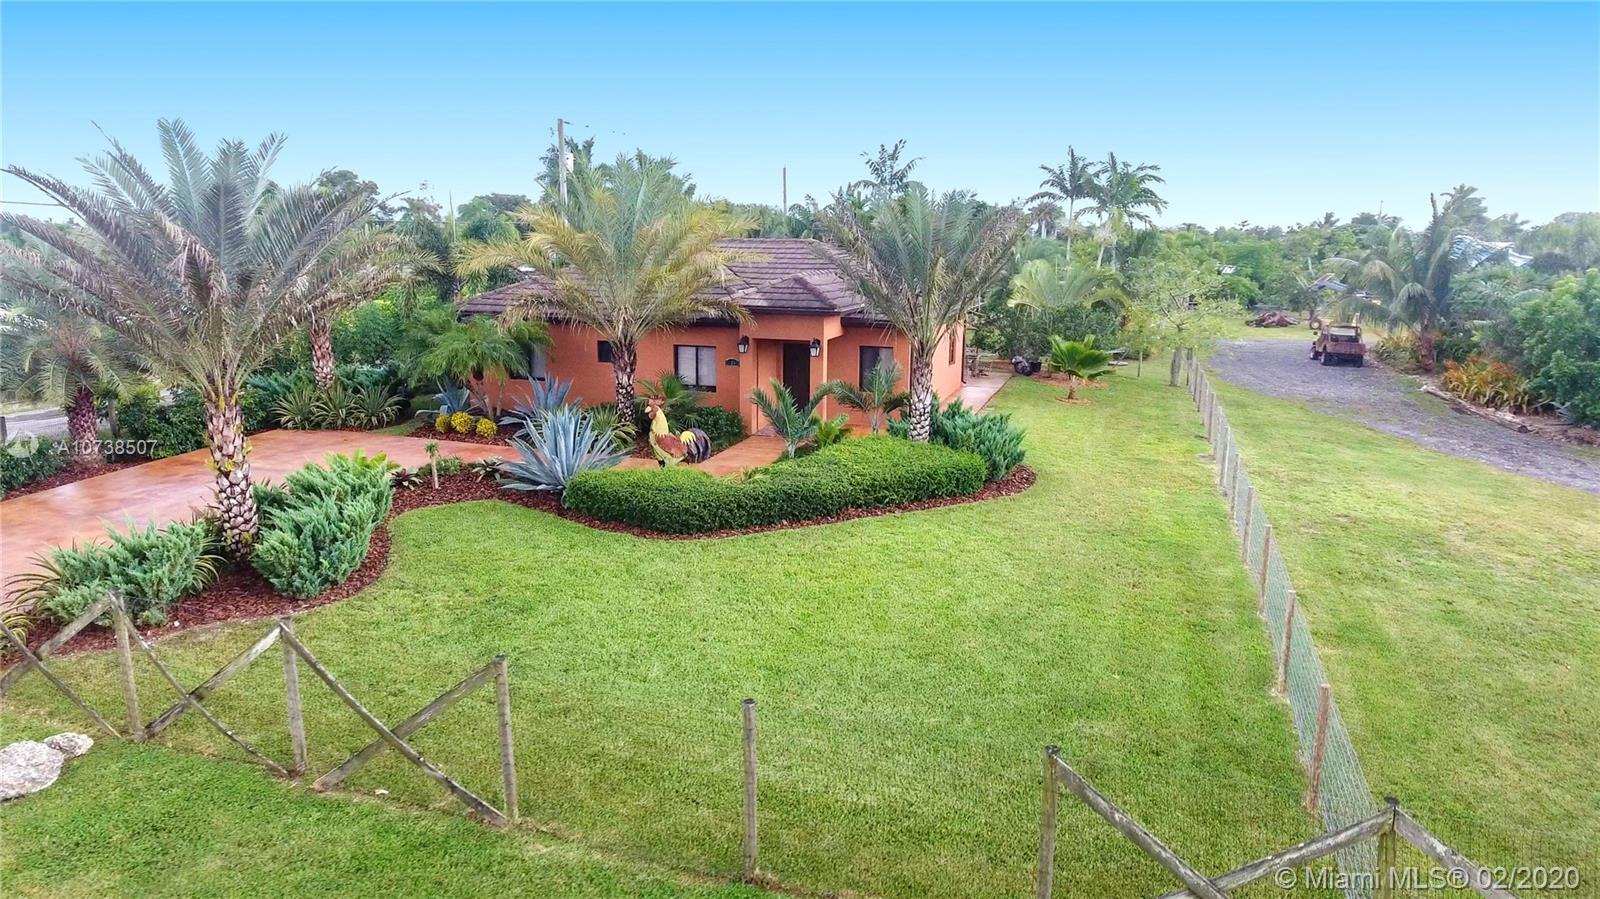 24501 SW 214th Pl, Homestead, FL 33031 - Homestead, FL real estate listing